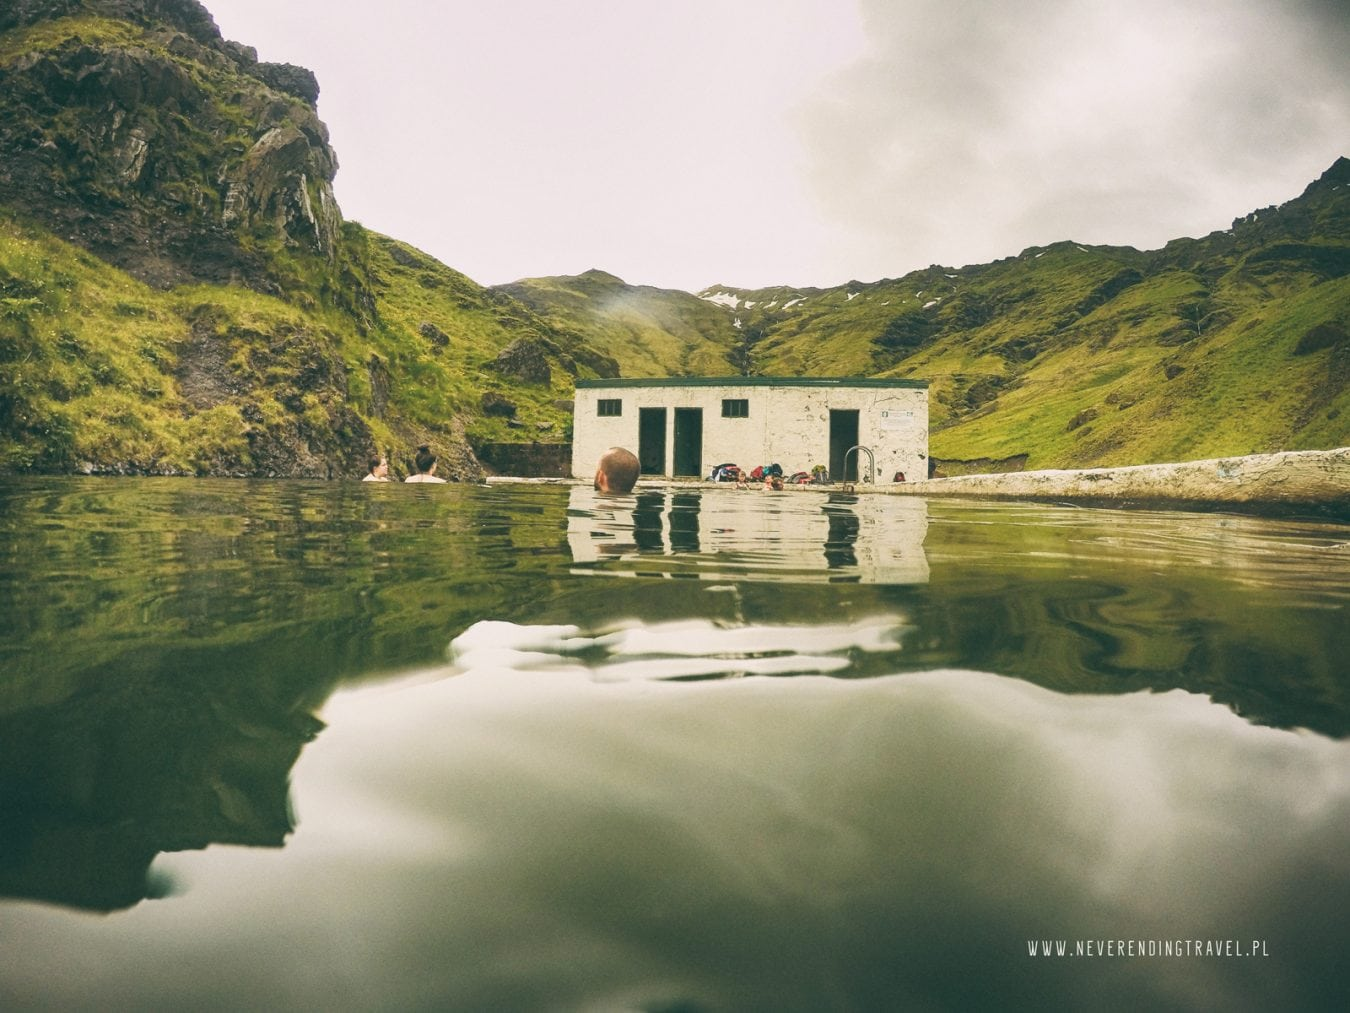 widok z wody opuszczony basen Seljavallalaug w górach na Islandii neverendingtravel.pl